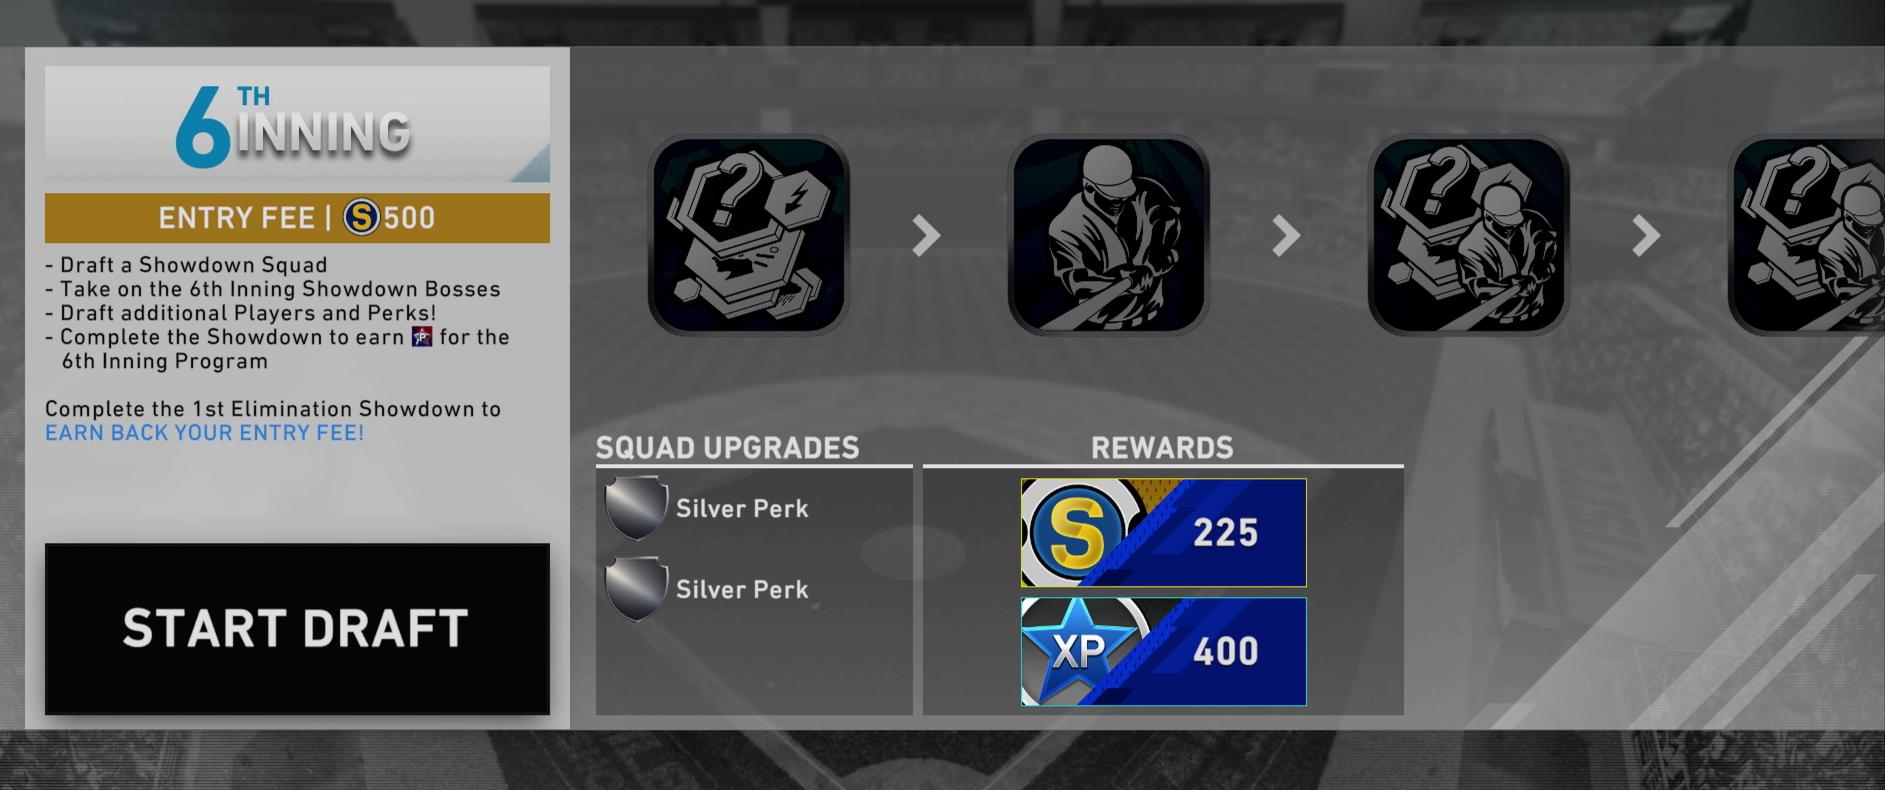 6th inning program showdown